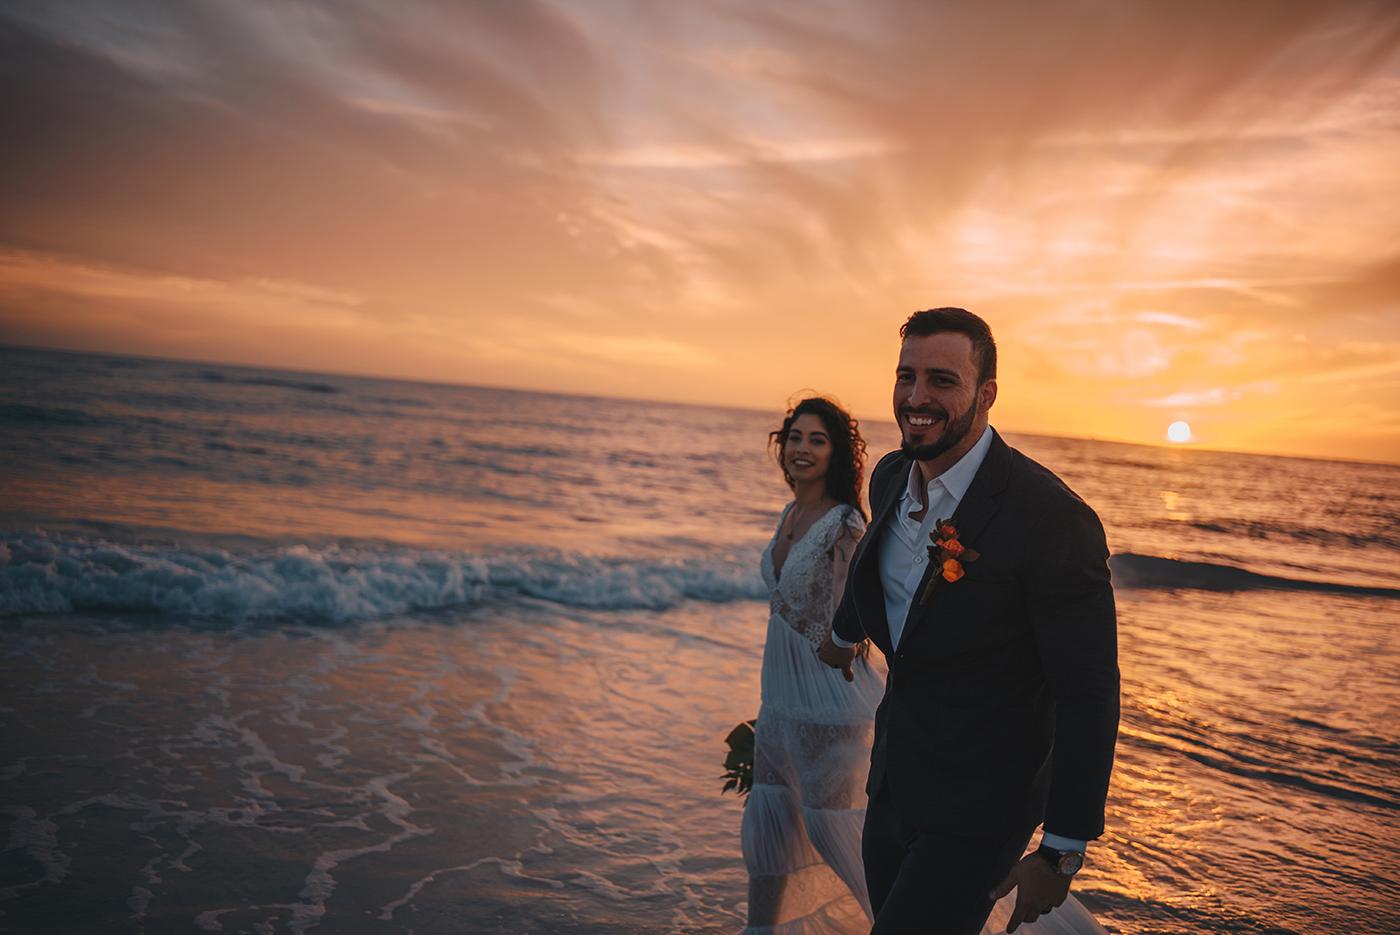 Los-Vargas-Photo-Moana-Wedding-Style-shoot-134.jpg